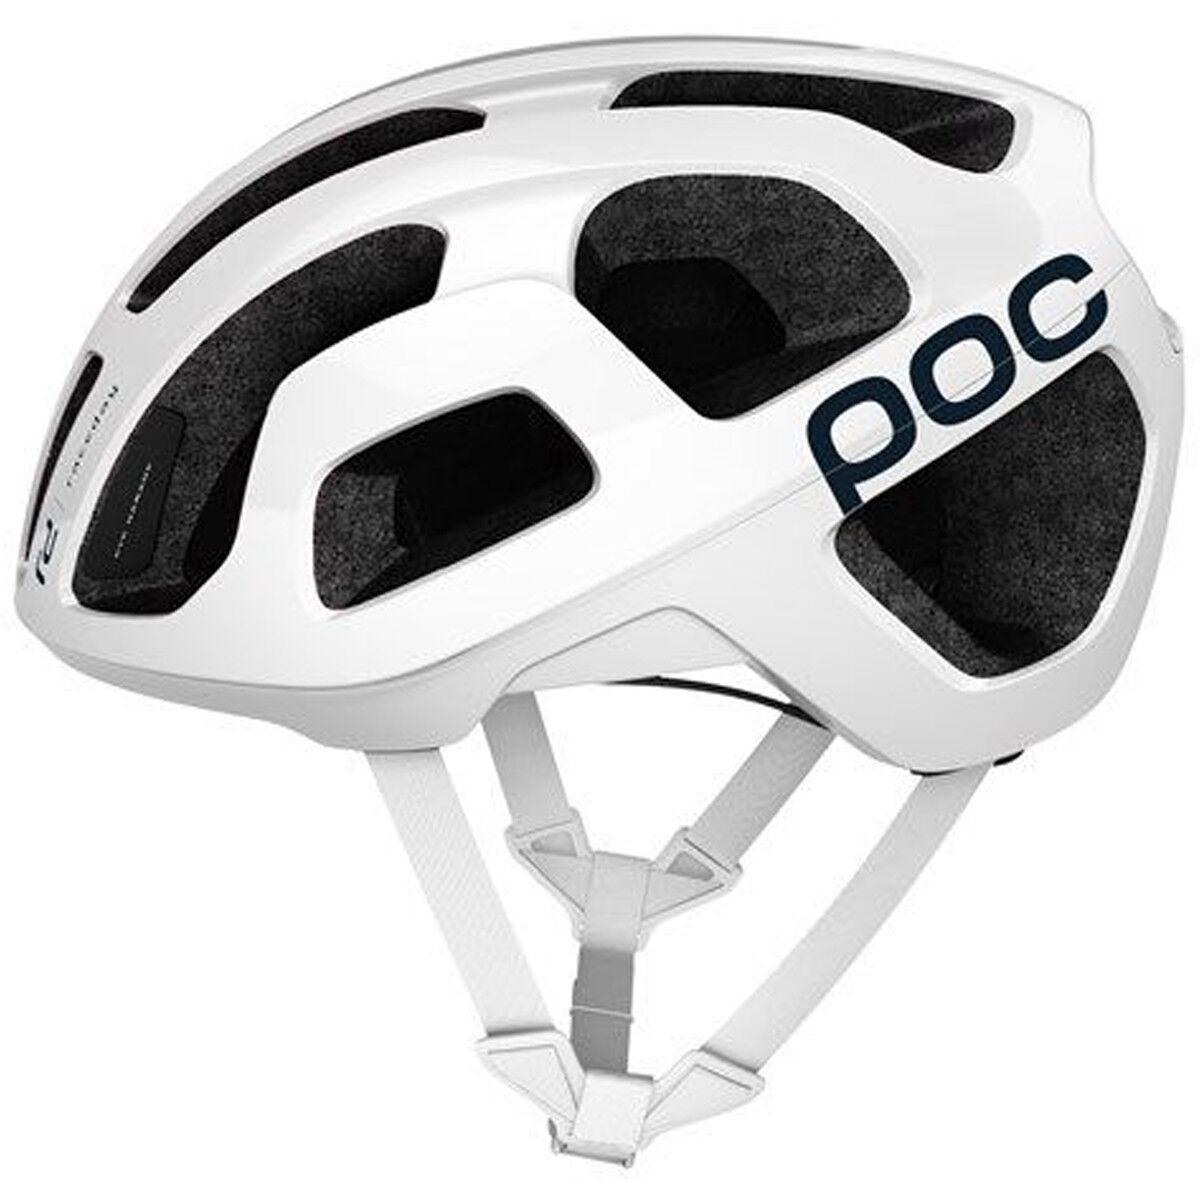 POC Octal Raceday (CPSC) bicicleta ciclismo casco hidrógeno blancooo Pequeño S 50 56 Cm